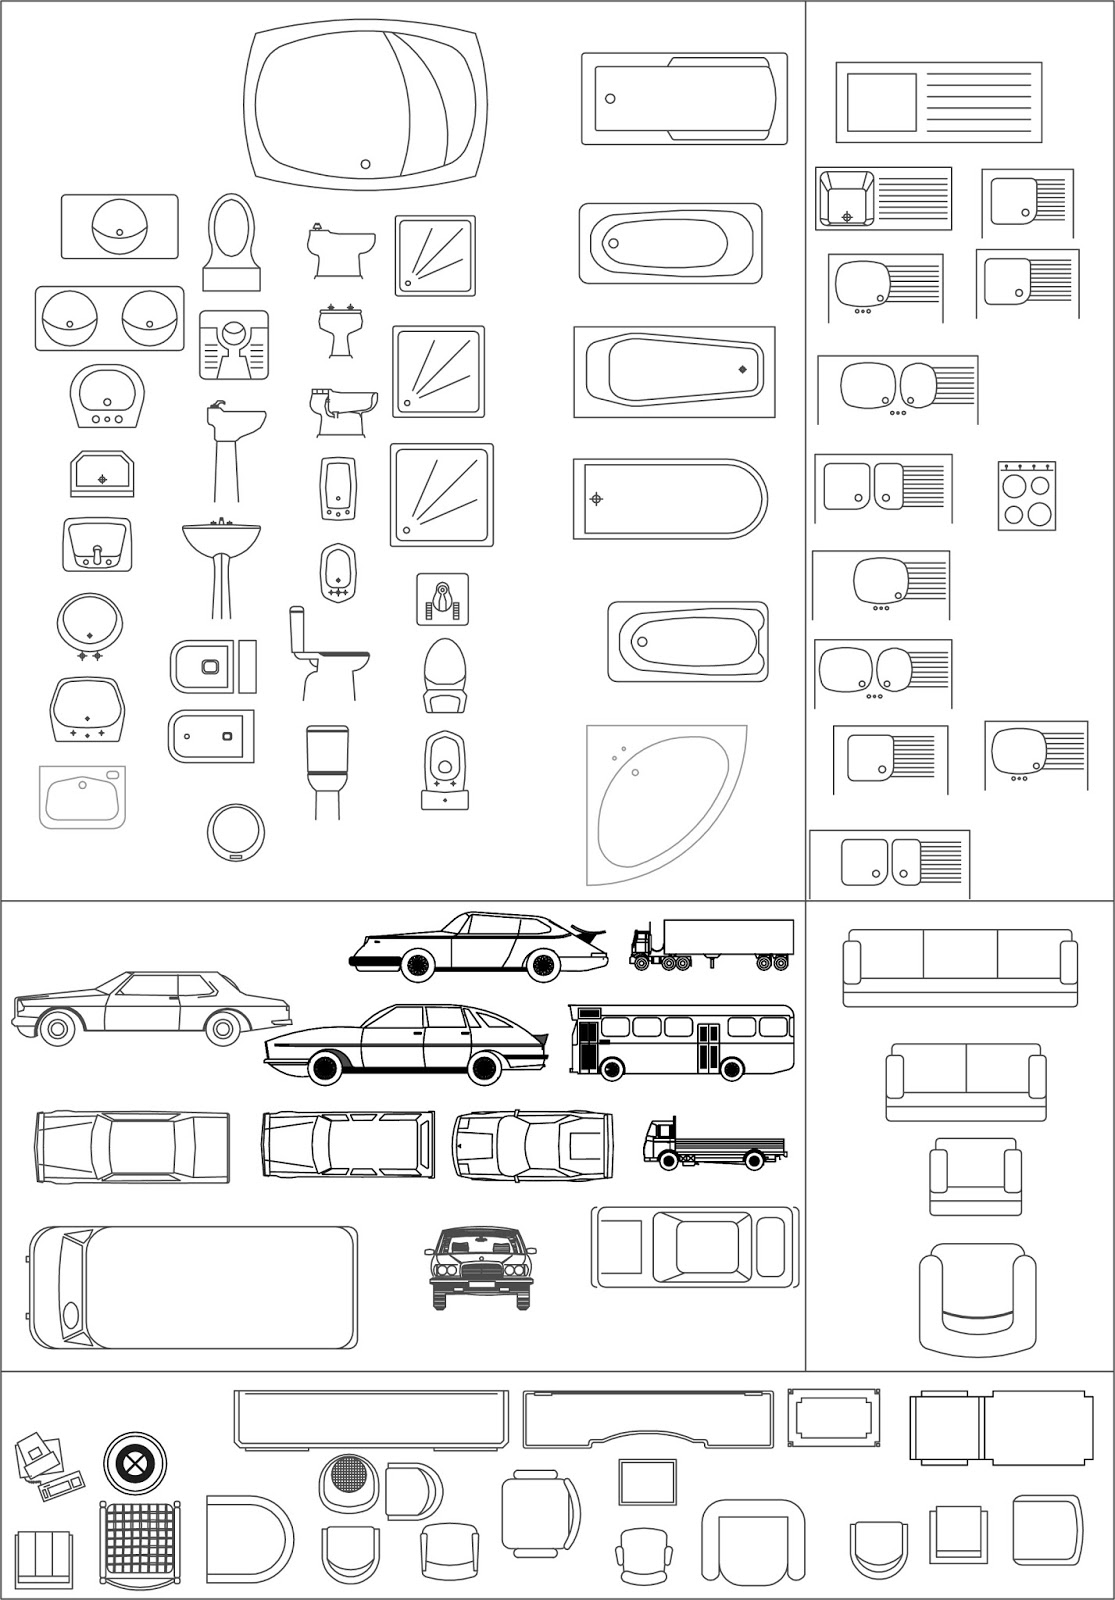 Ideark cali softwares aplicados a dise o ingenieria y for Medidas en arquitectura pdf